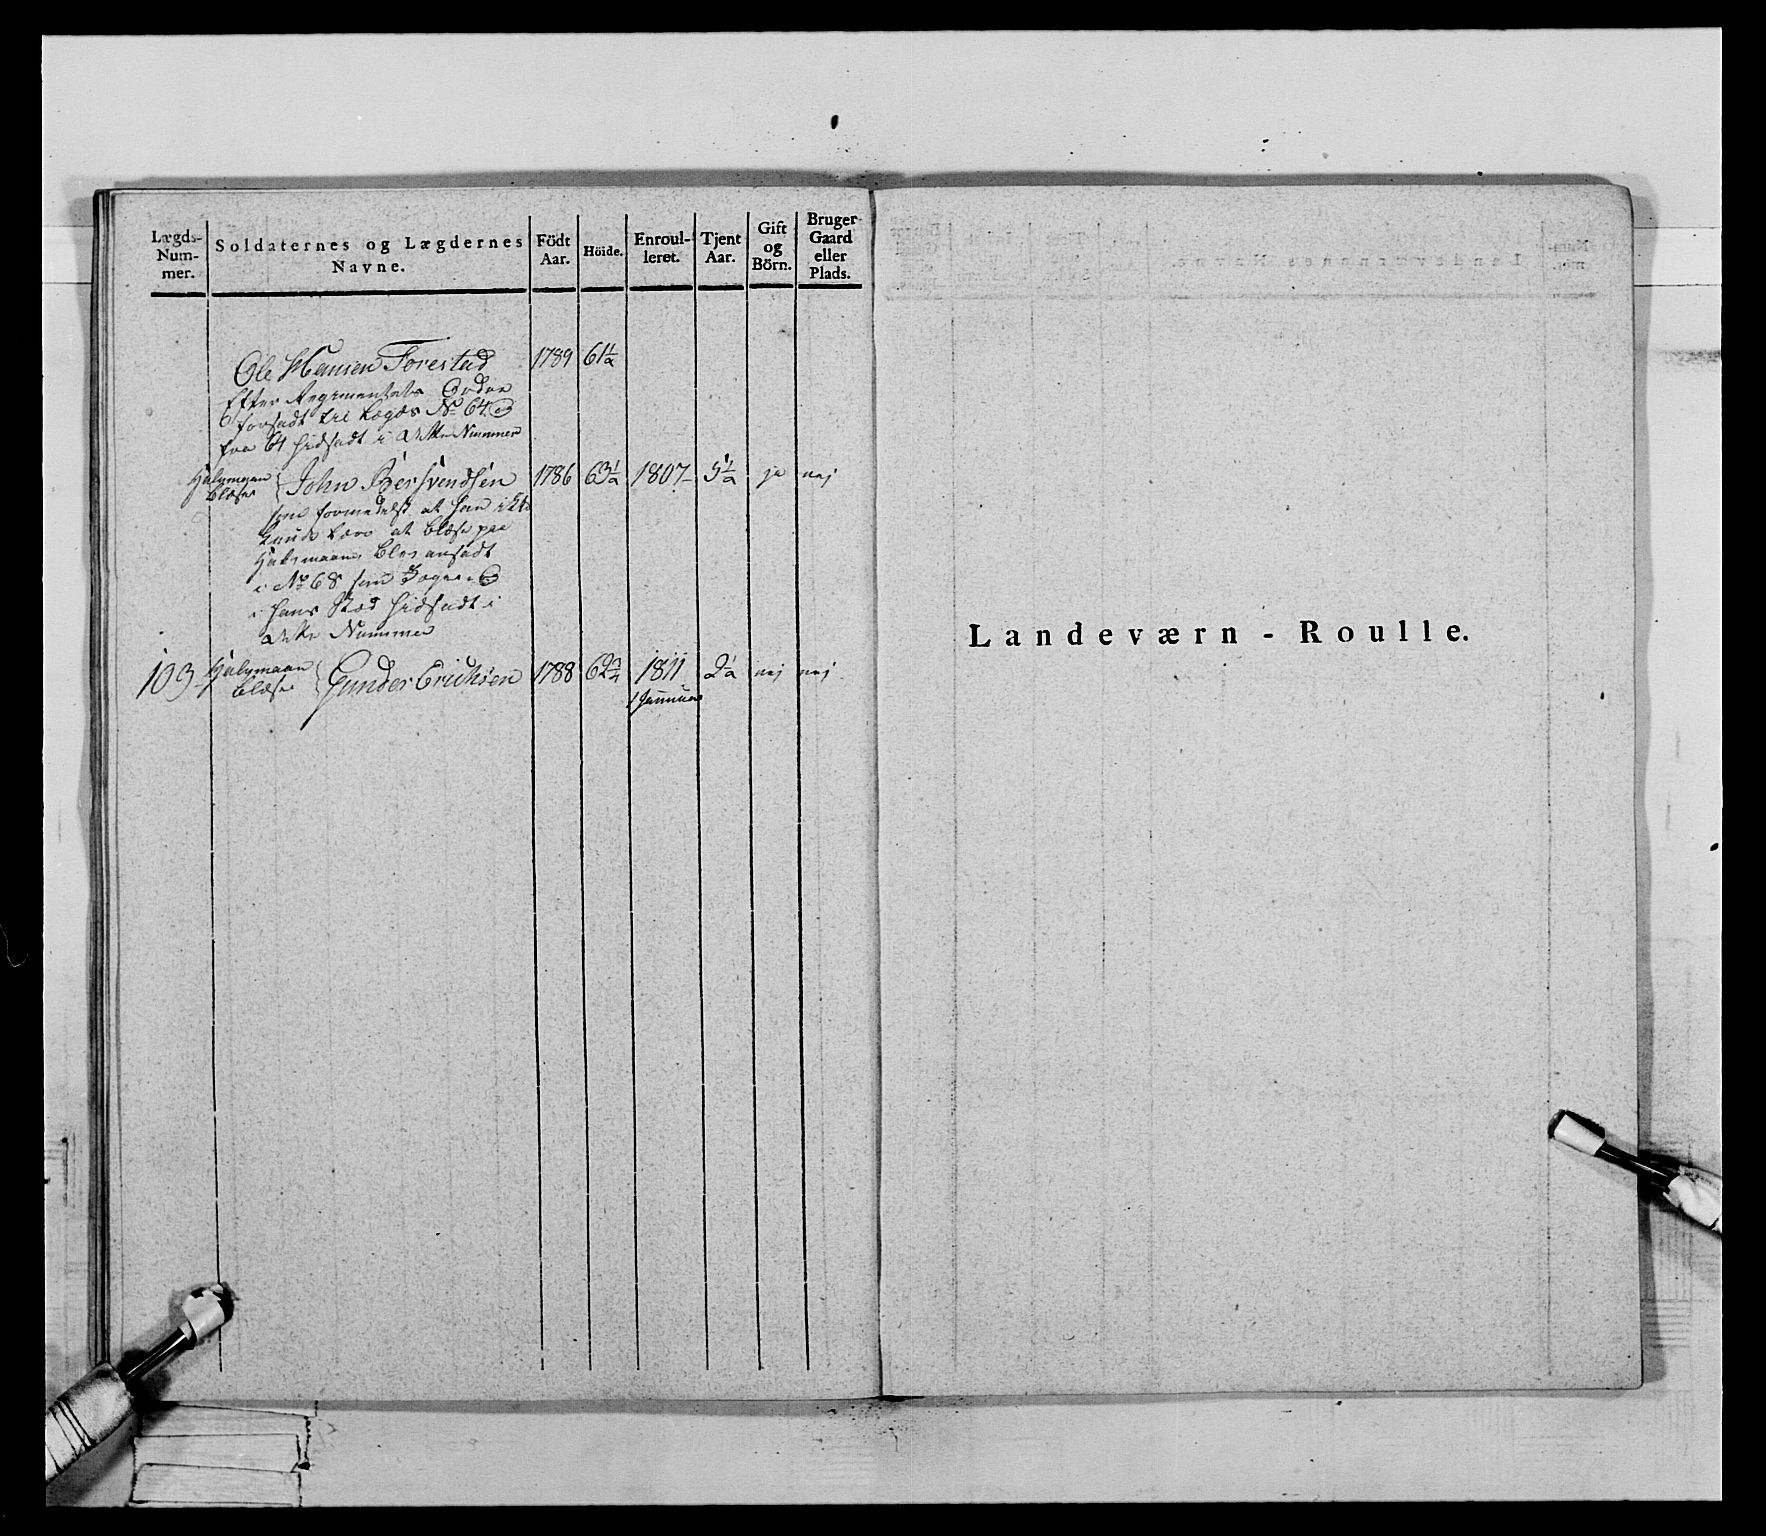 RA, Generalitets- og kommissariatskollegiet, Det kongelige norske kommissariatskollegium, E/Eh/L0069: Opplandske gevorbne infanteriregiment, 1810-1818, s. 597